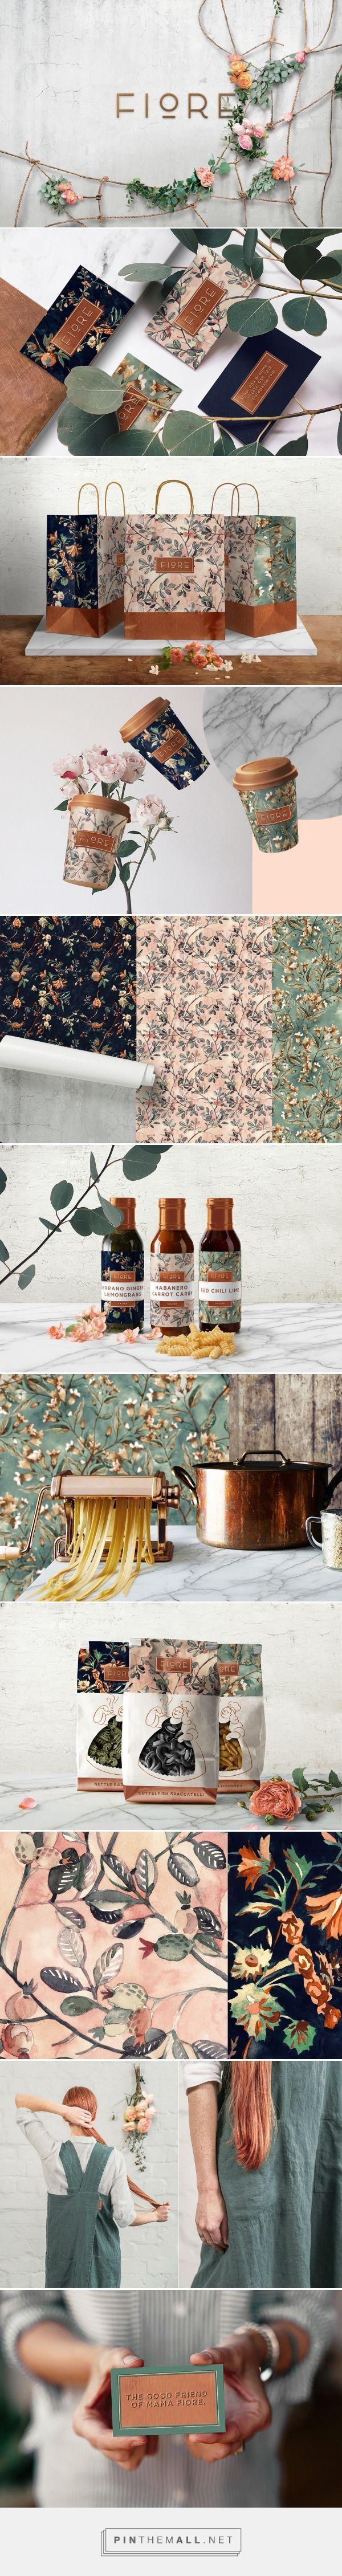 FIORE Italian Restaurant Branding by Noname Branding | Fivestar Branding Agency – Design and Branding Agency & Curated Inspiration Gallery